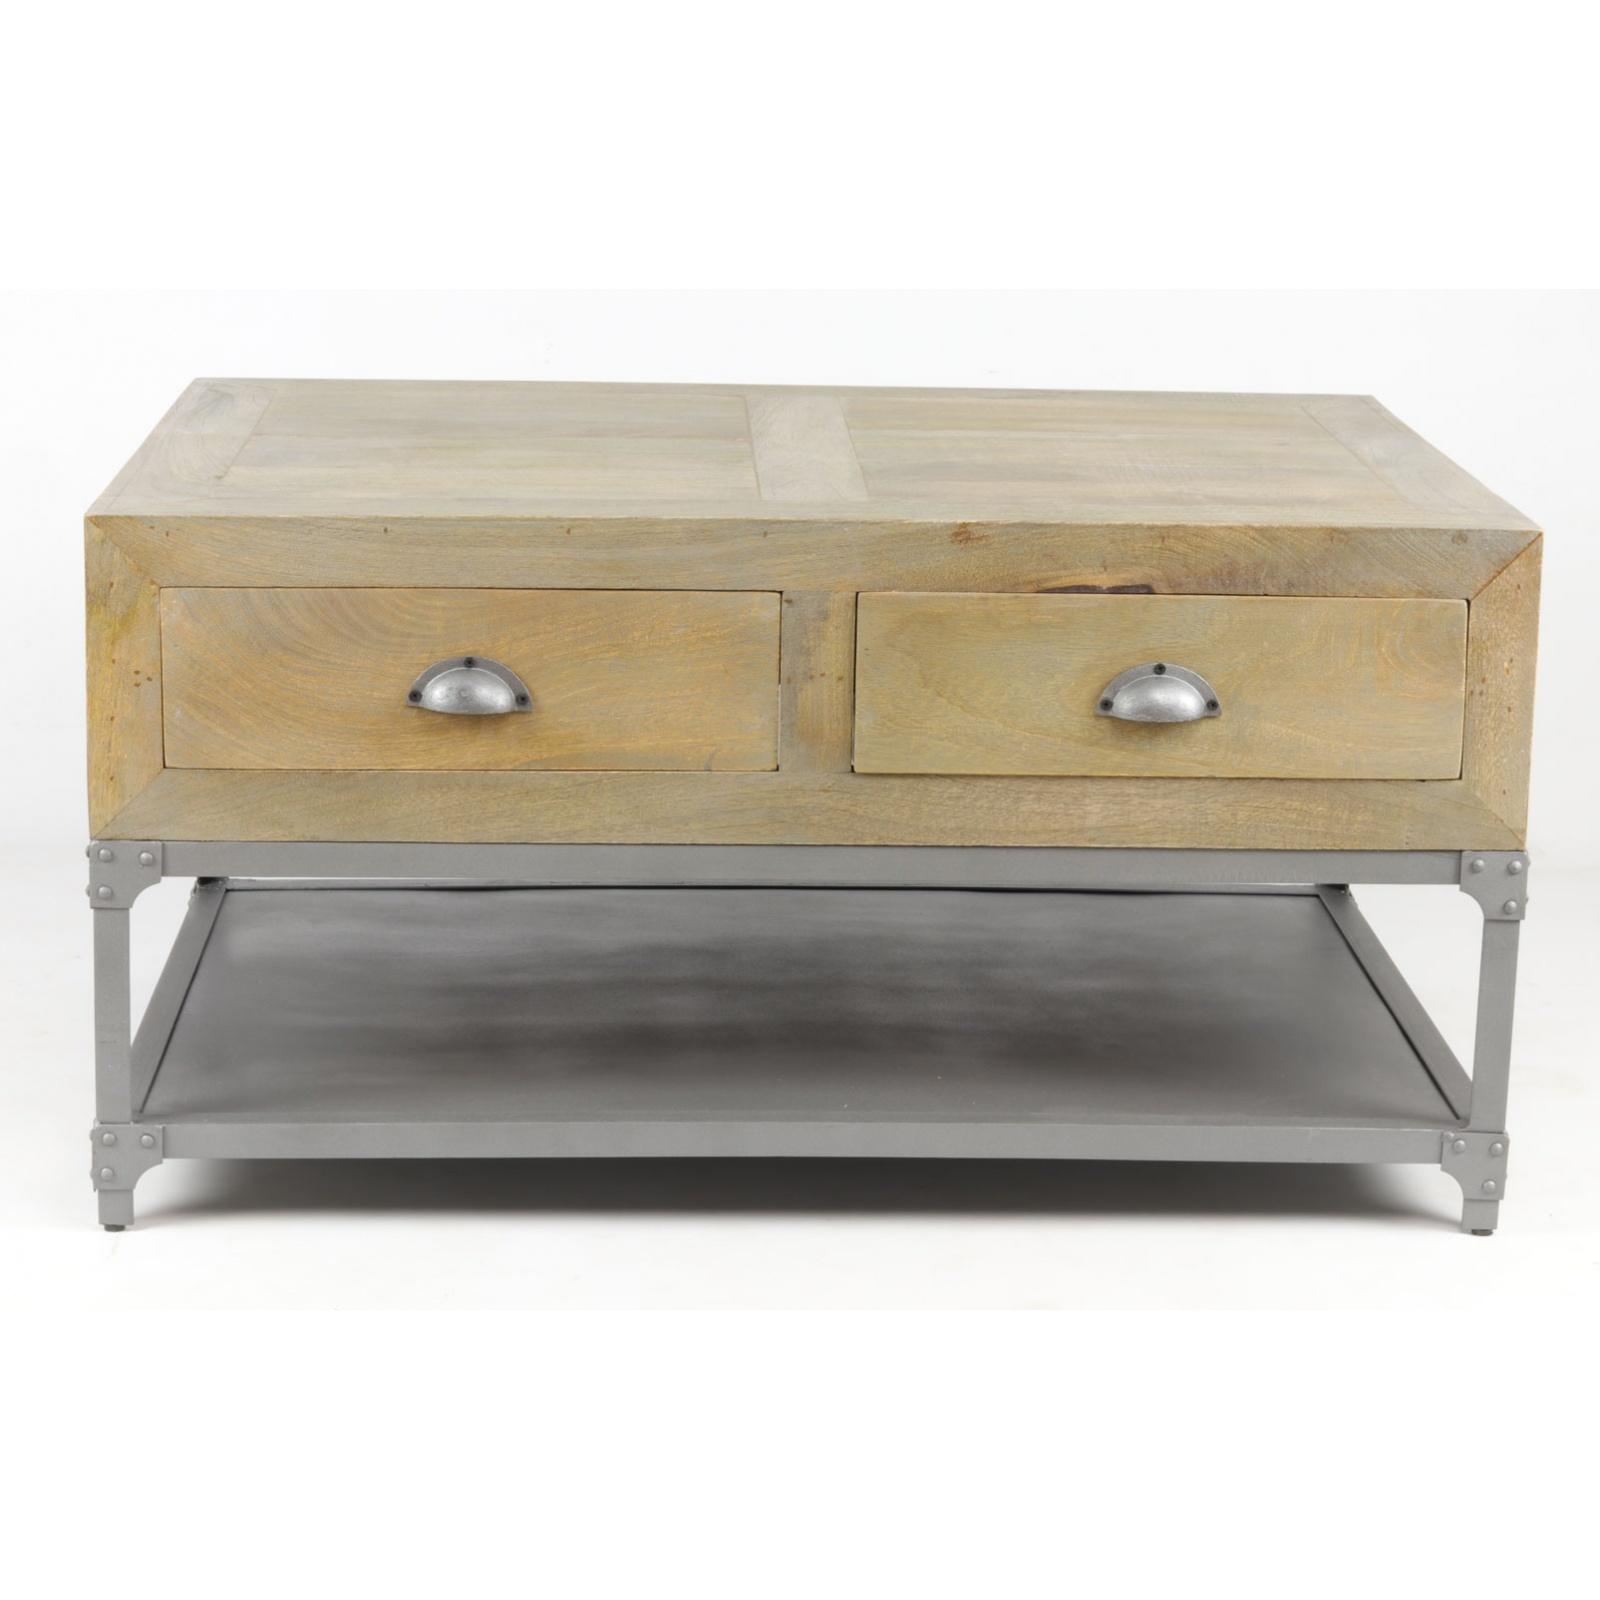 petite table basse industrielle. Black Bedroom Furniture Sets. Home Design Ideas